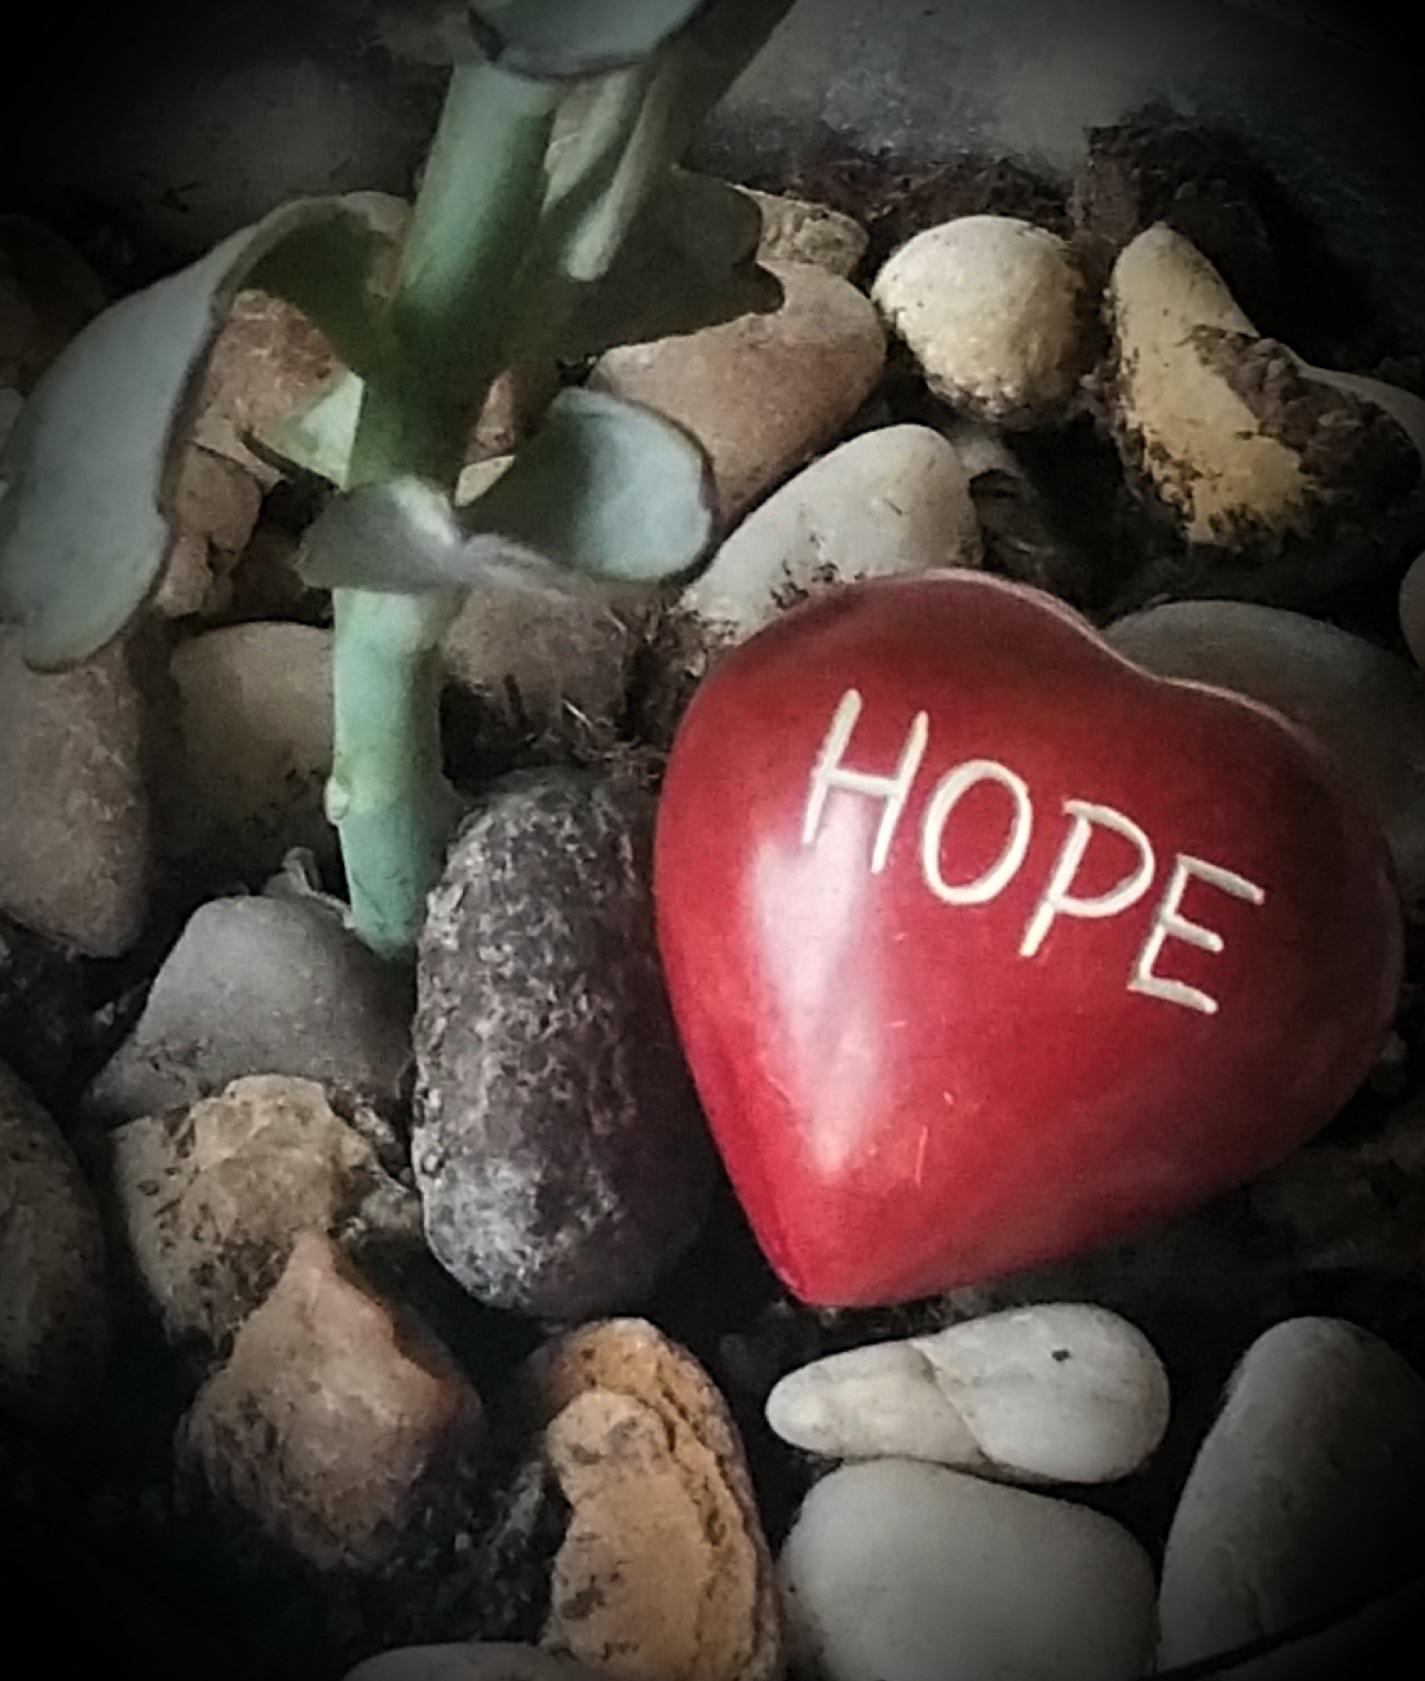 Got Hope Advance Care Planning Services